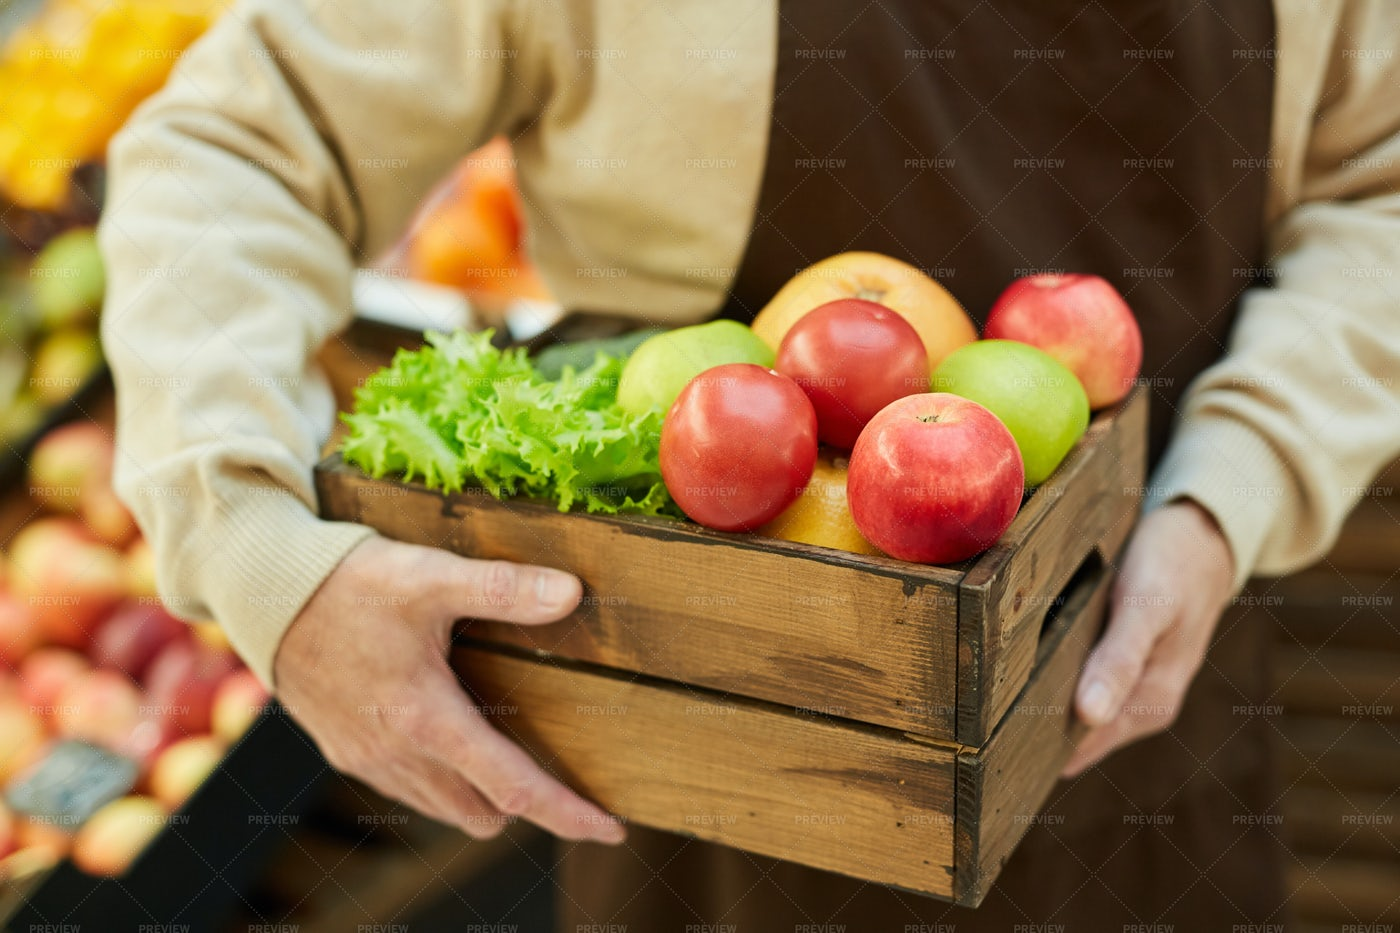 Holding Box Of Produce: Stock Photos